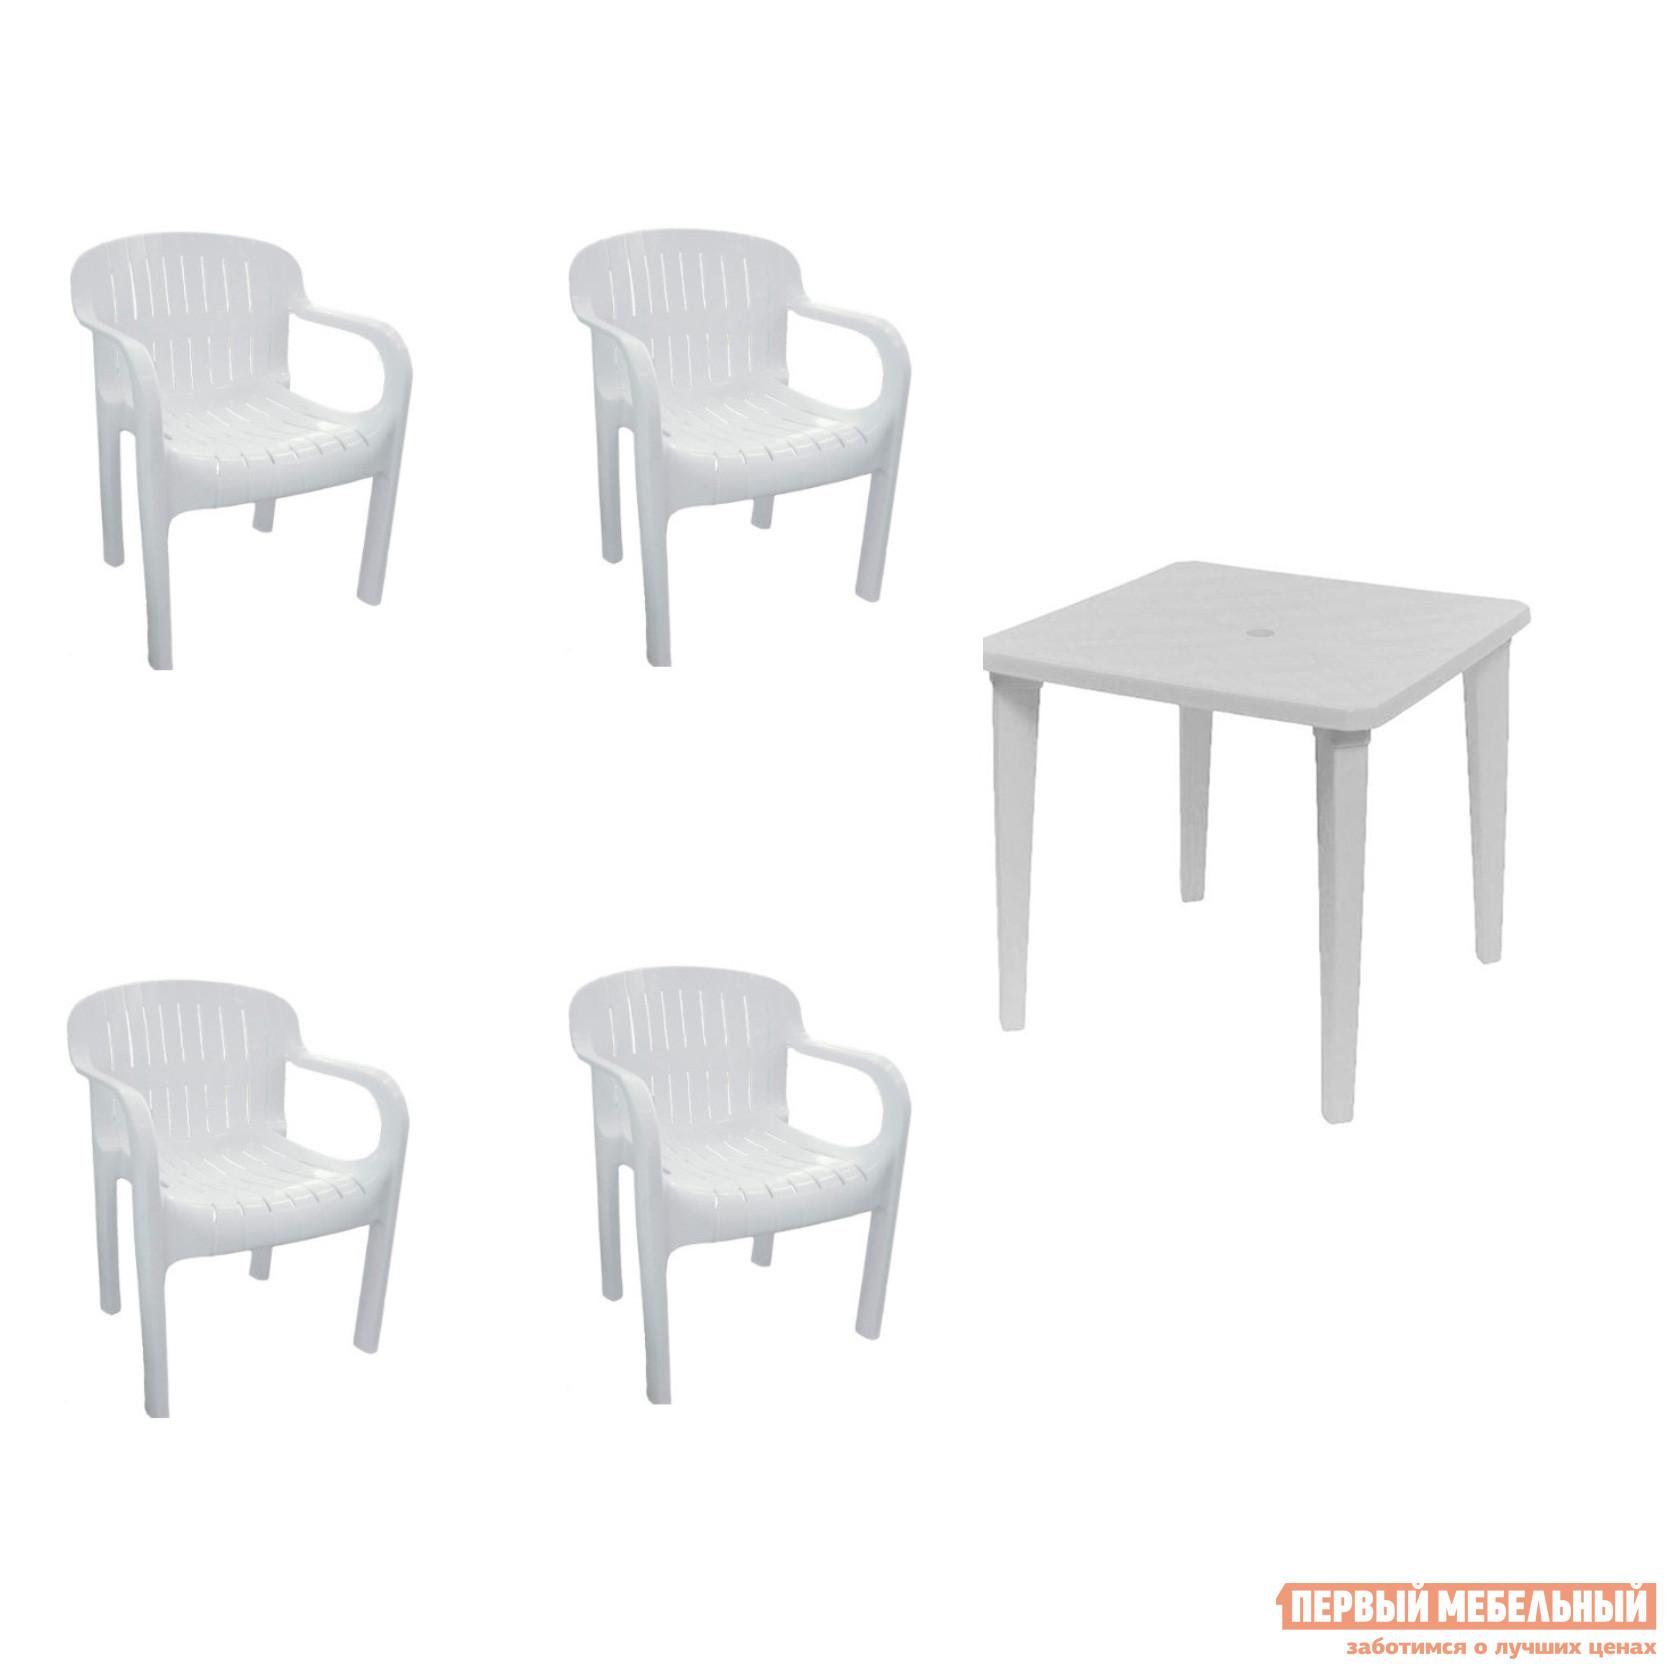 Набор пластиковой мебели Стандарт Пластик Стол квадратный (800х800х710)+Кресло №4 «Летнее» (610х480х810)мм, 4 шт. Белый